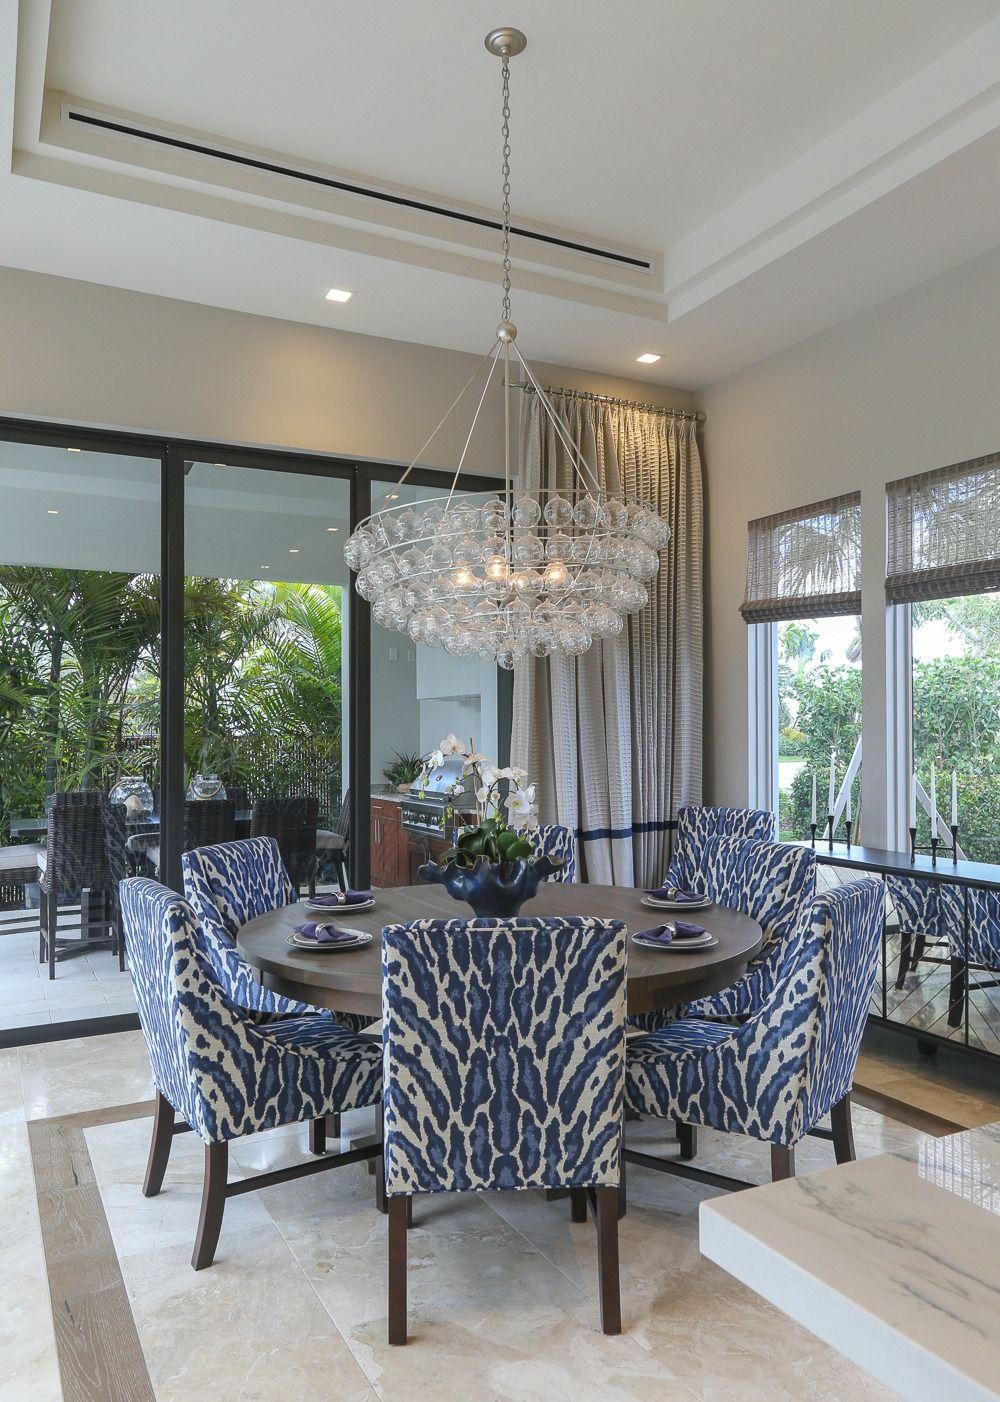 Naples Florida Parade Of Homes Recap Classy Dining Room Room